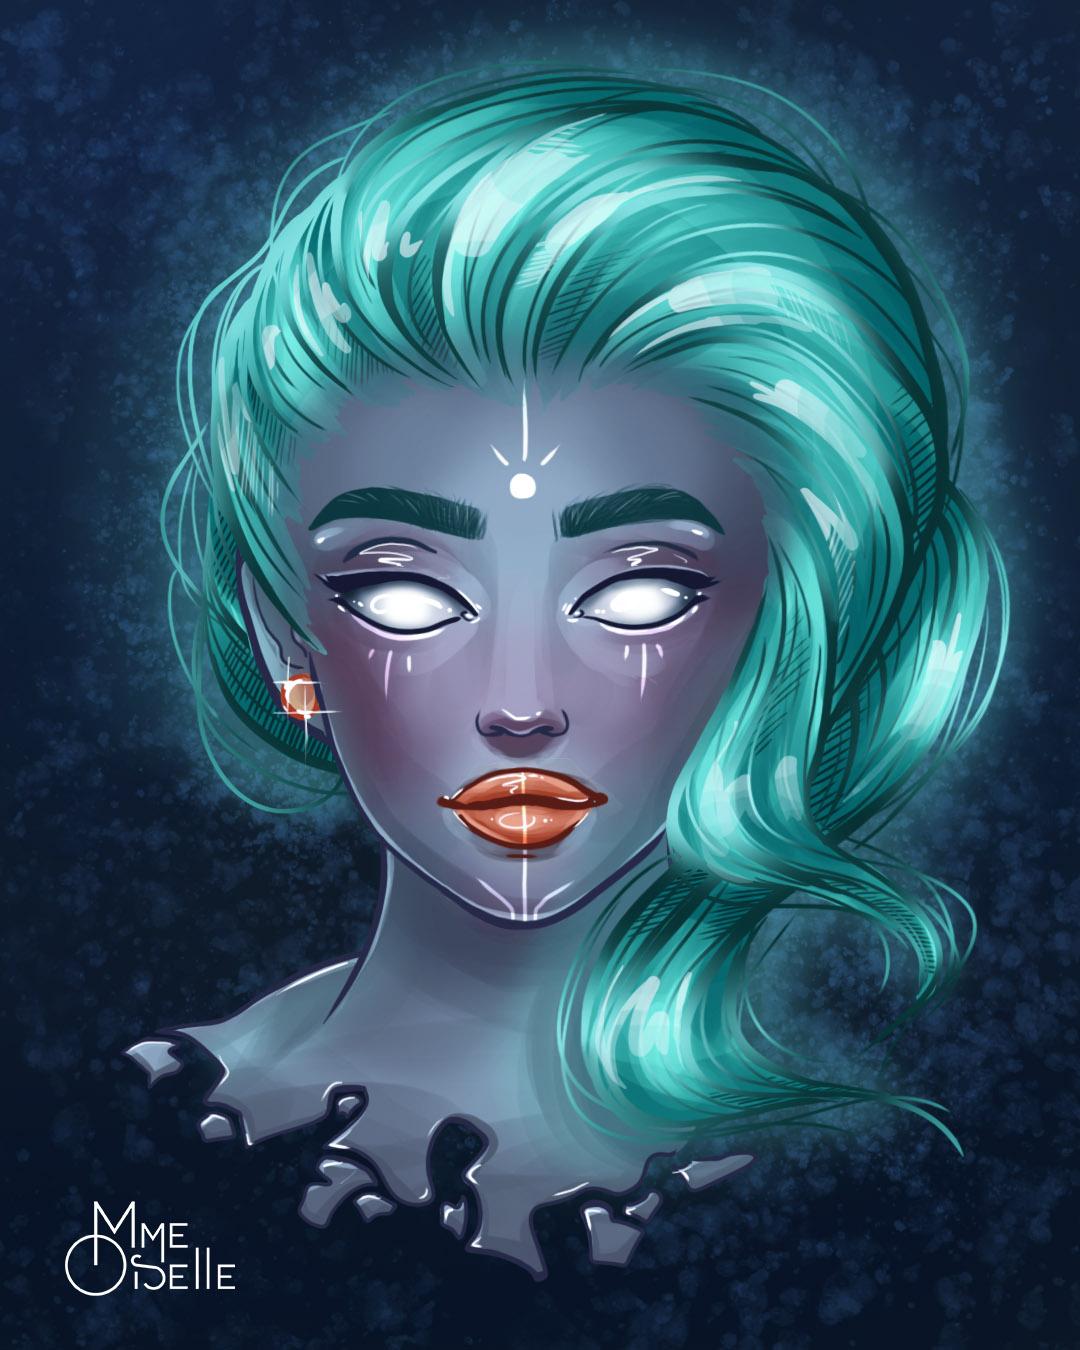 DTIYS_Aqua